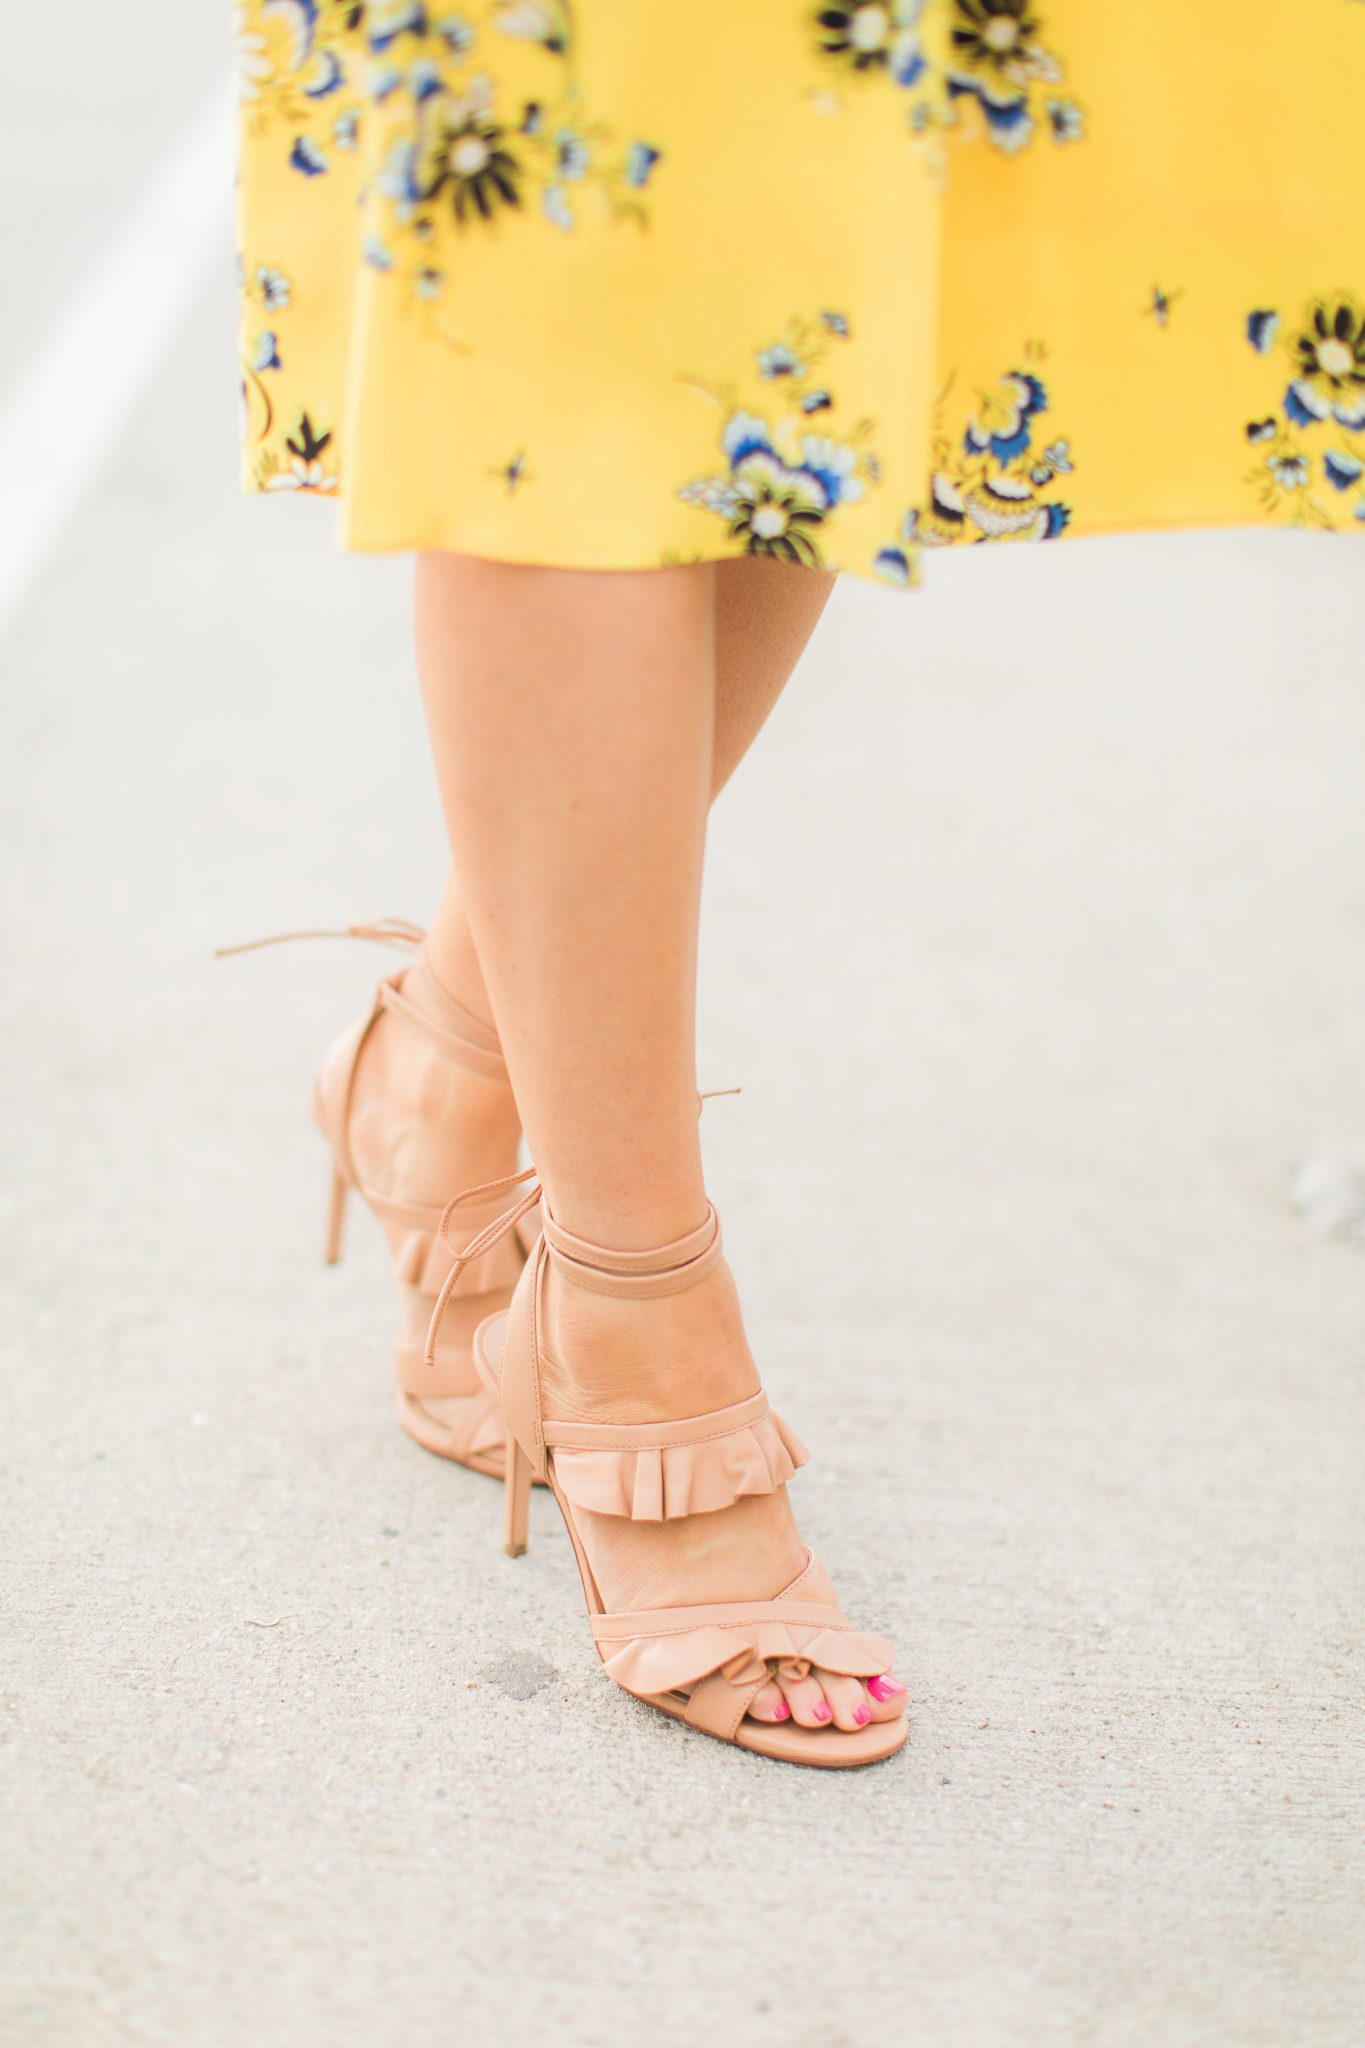 popular Orange County fashion blogger Maxie Elle